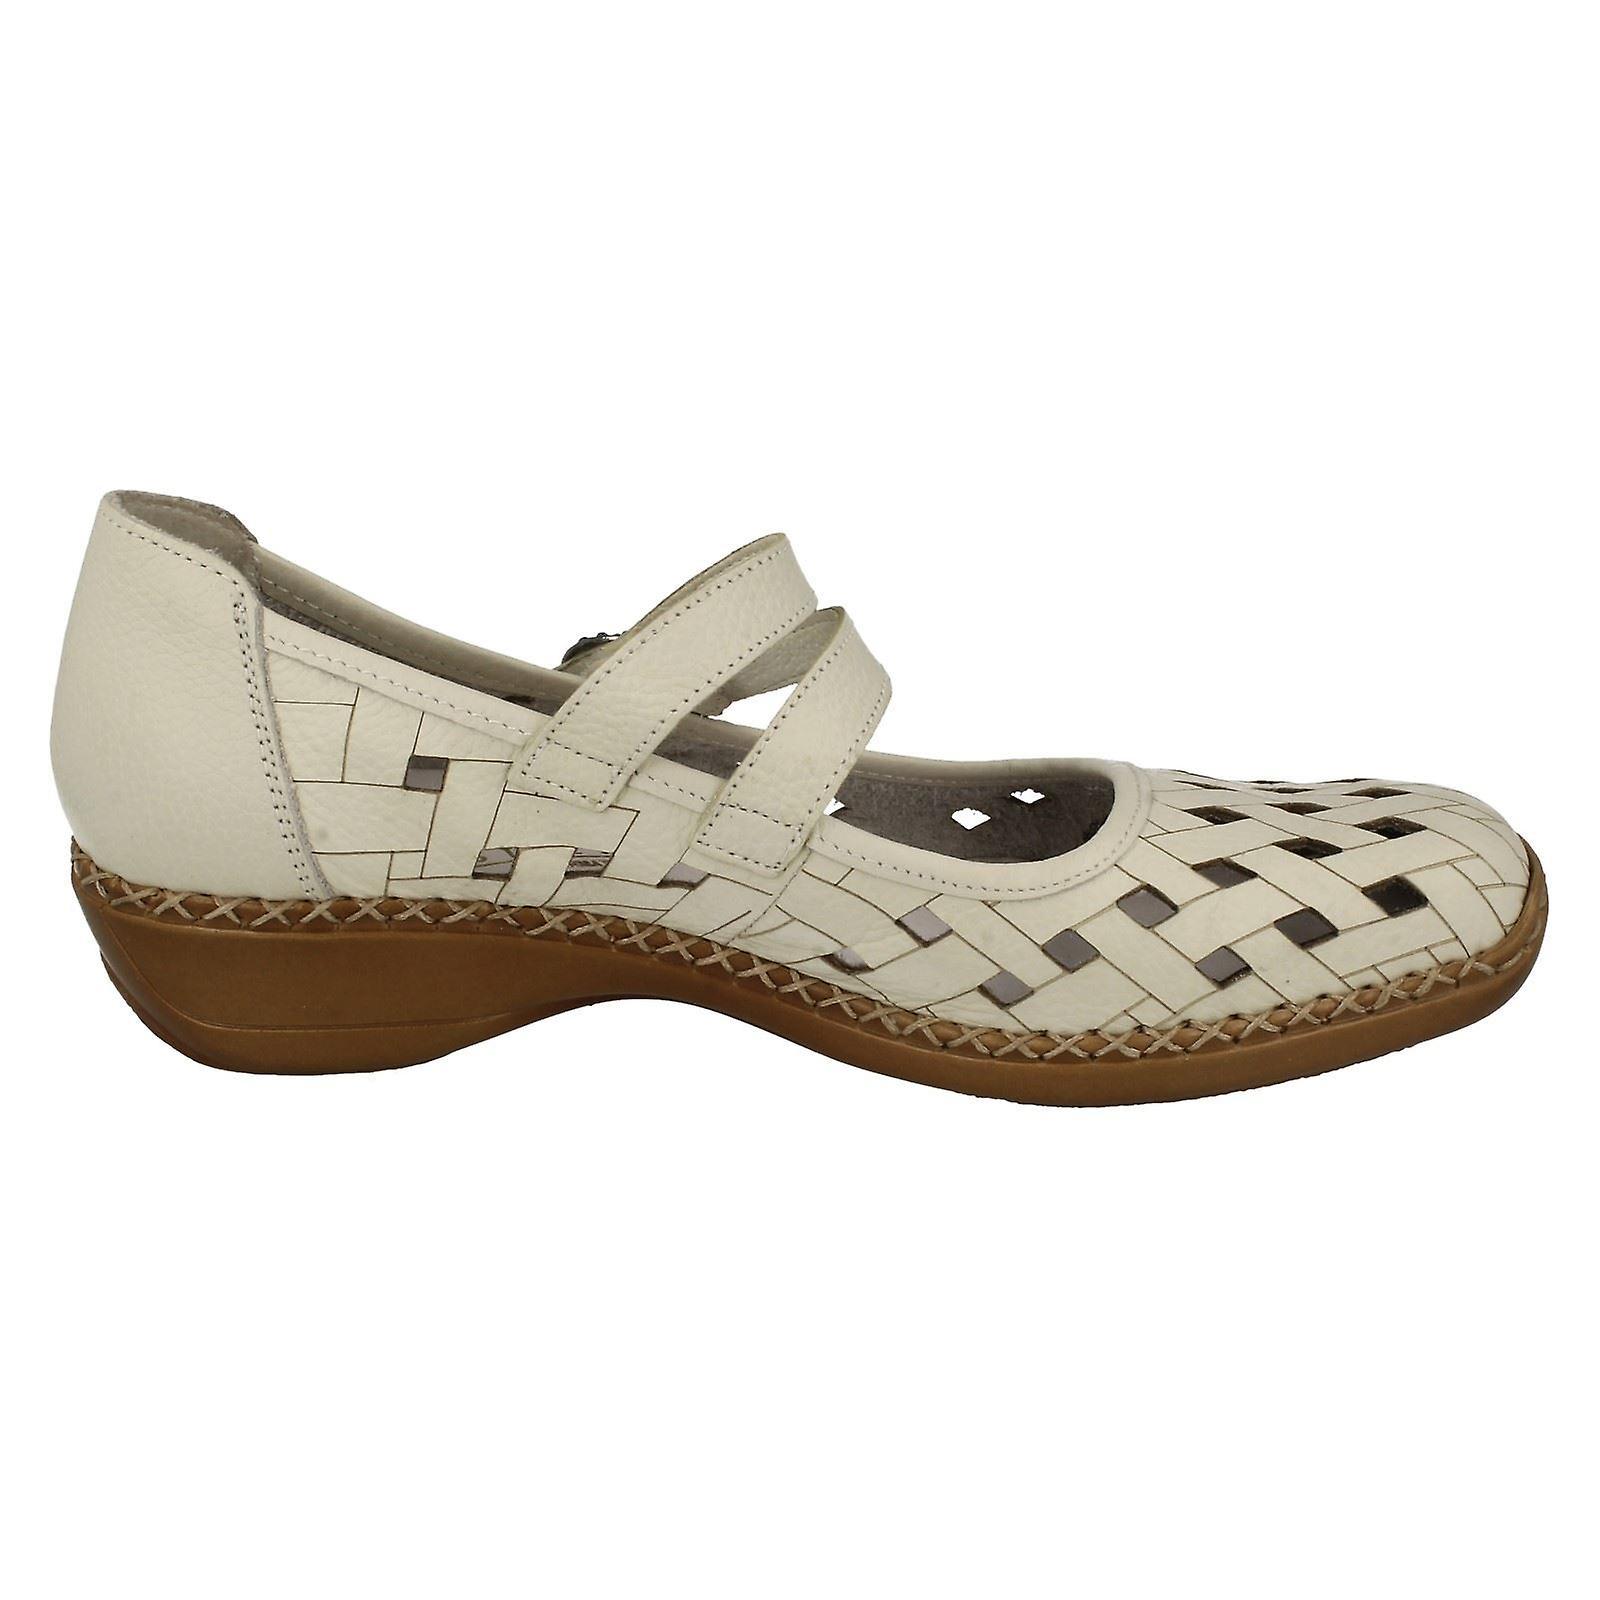 Ladies Rieker Casual Summer Shoes 41375